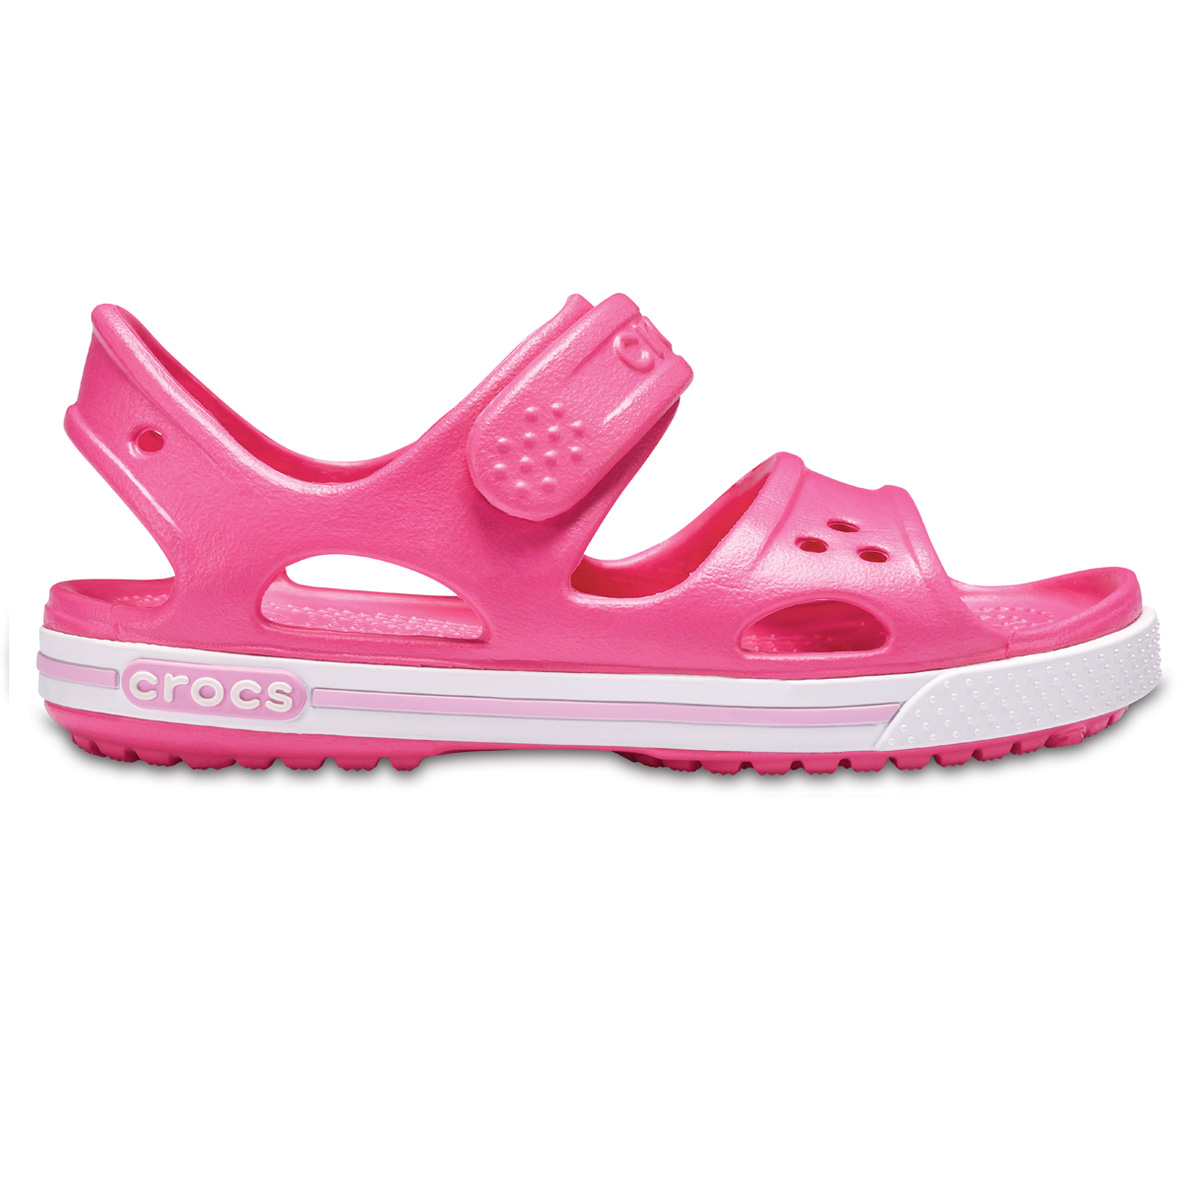 Crocs Crocband II Sandal PS - Cennet Pembesi/Karanfil